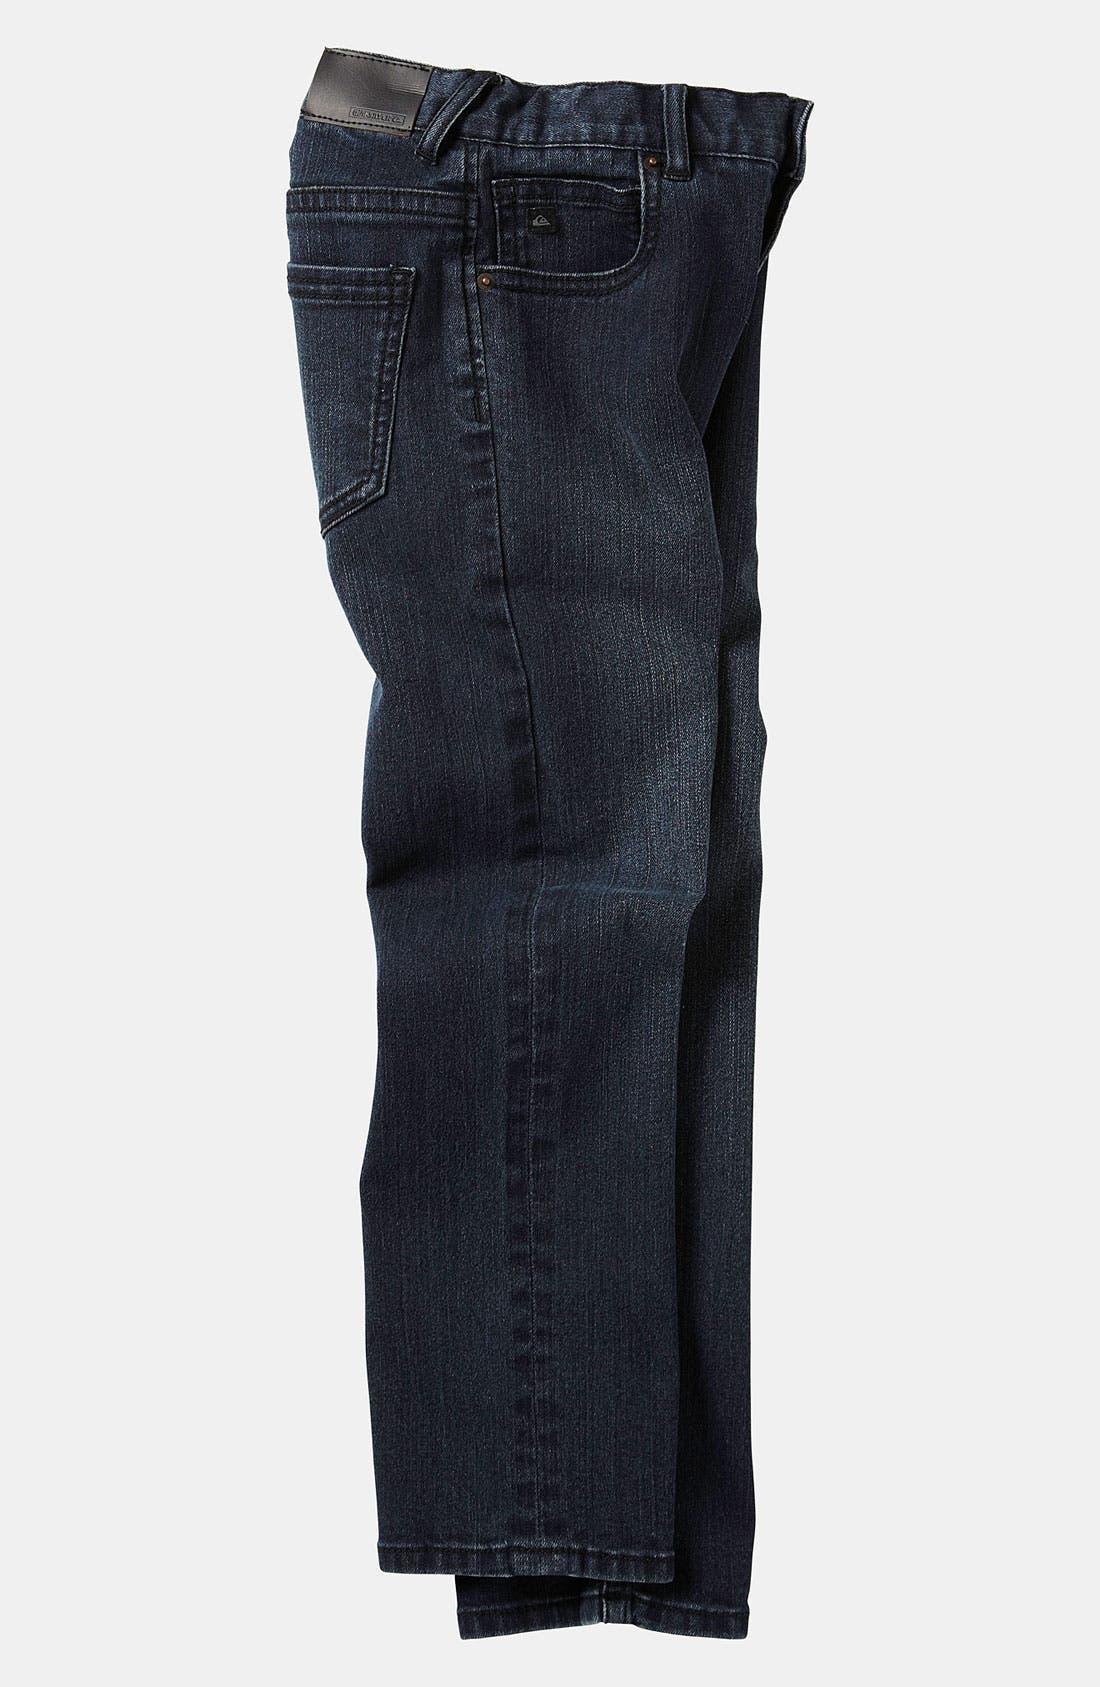 Alternate Image 2  - Quiksilver 'Distortion' Jeans (Infant)